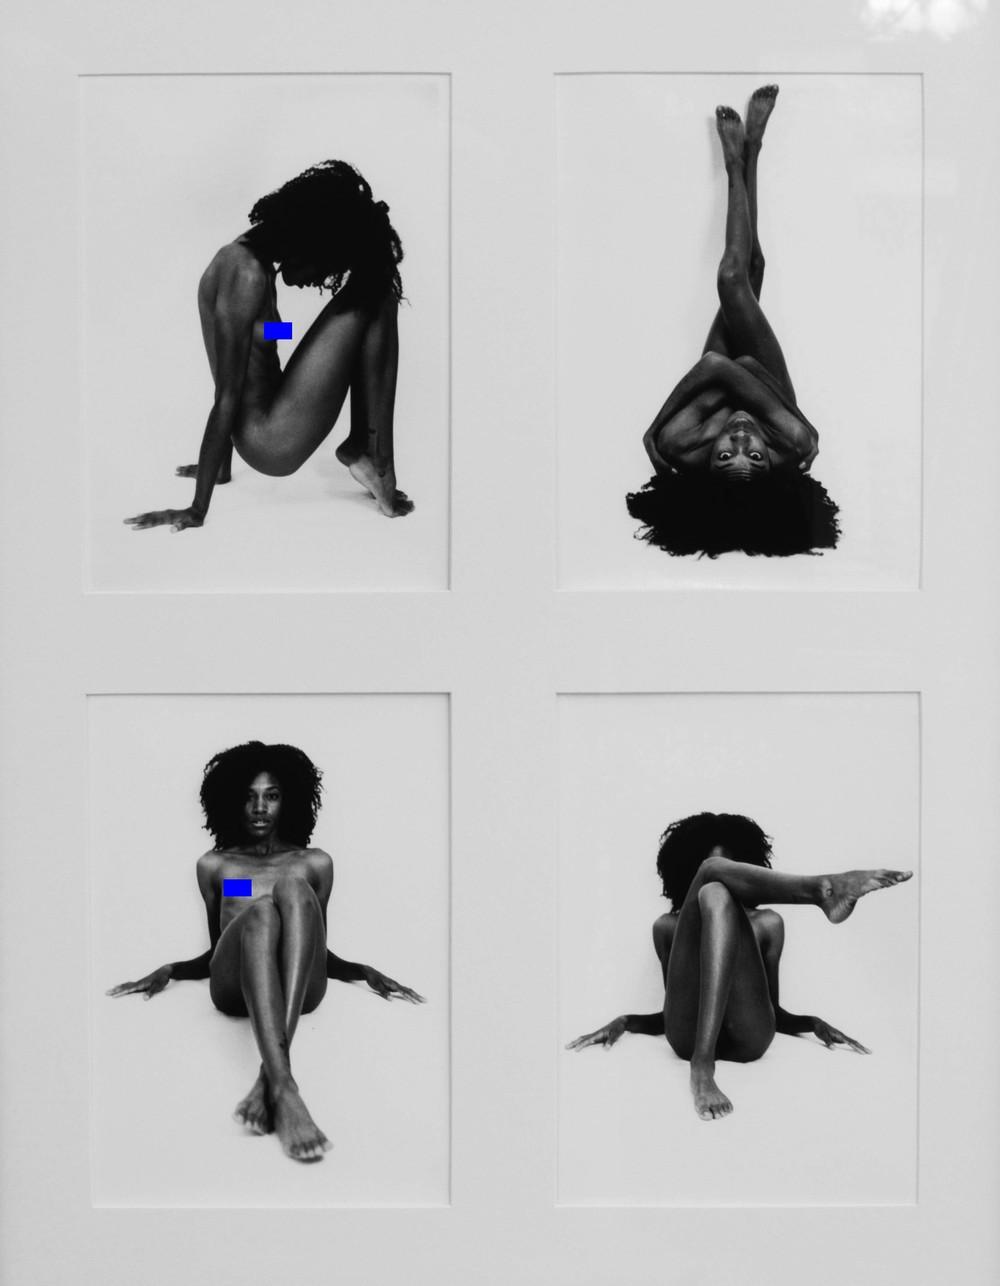 OliviaFinalpicture.jpg